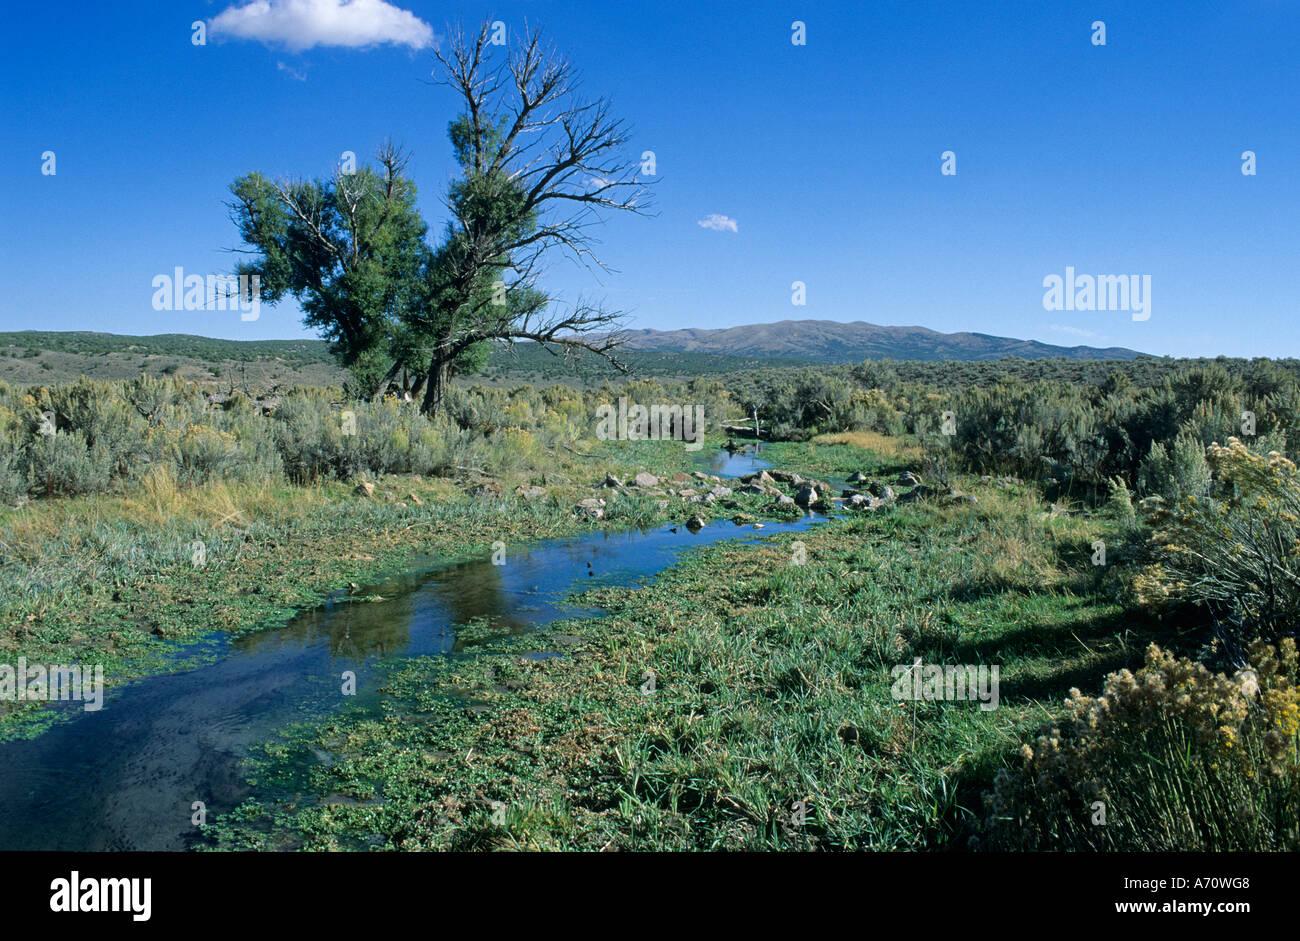 Creek at Rock Springs, historic California Trail, Nevada, USA - Stock Image